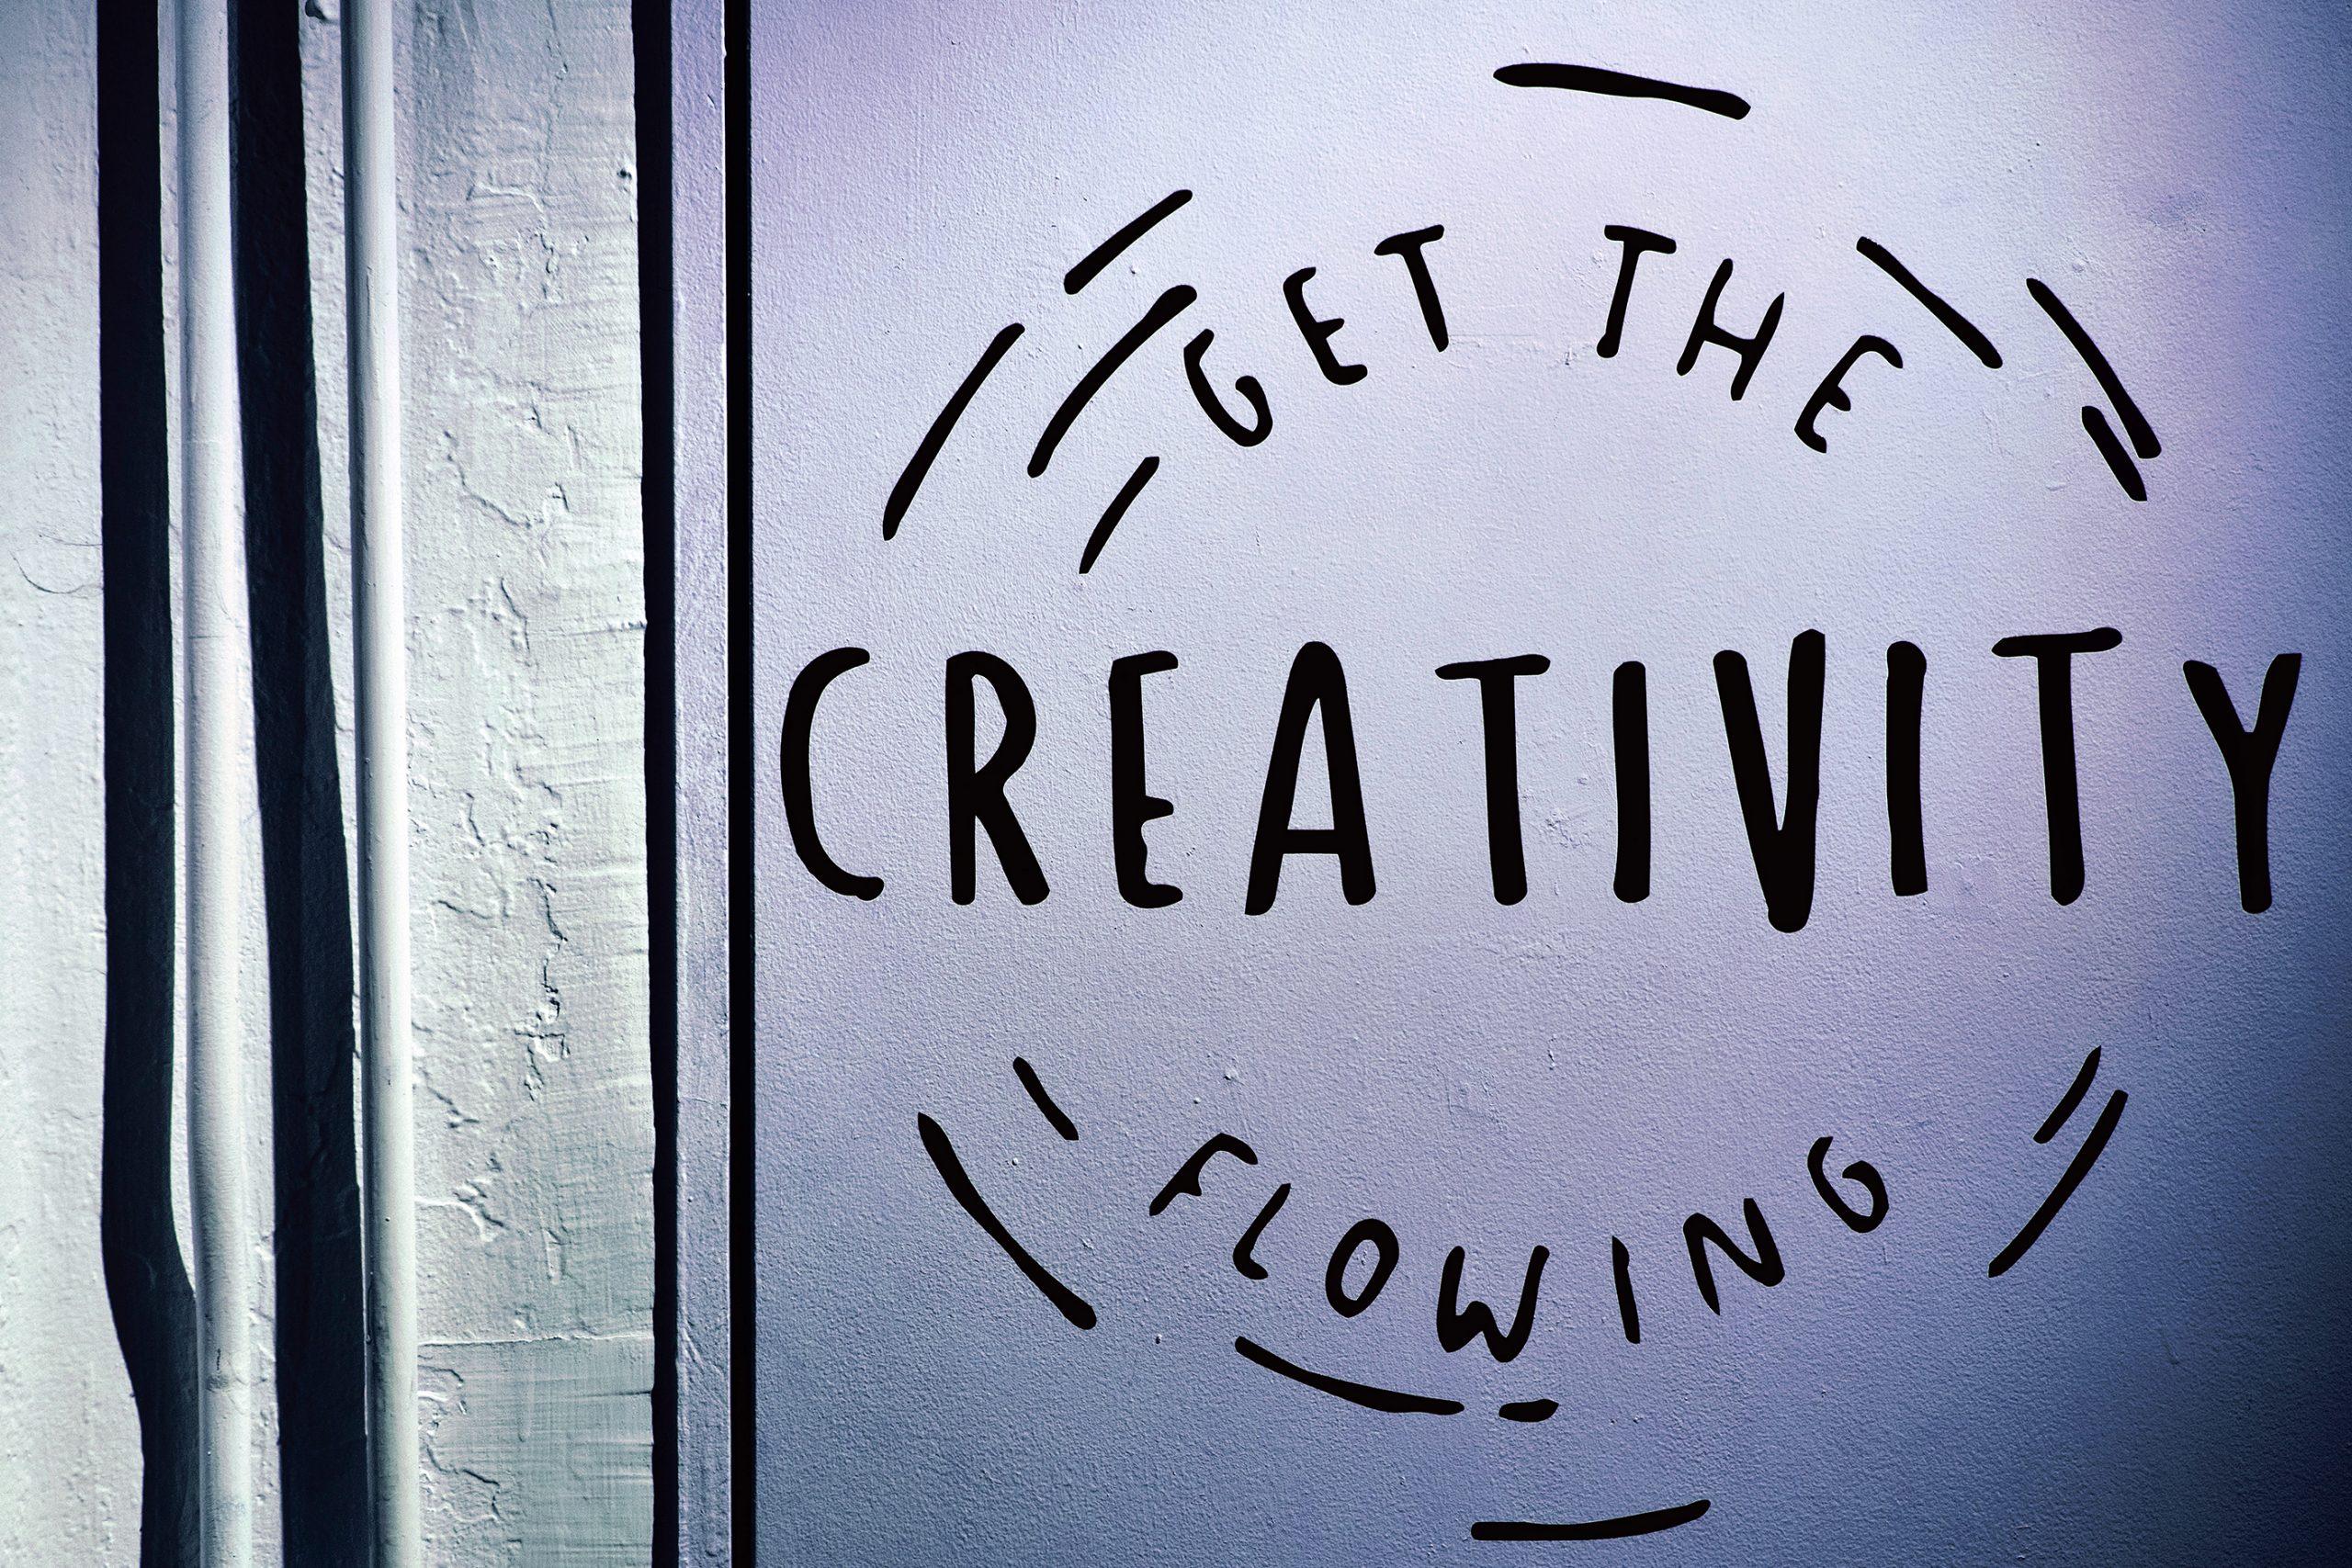 business creativity in lockdown